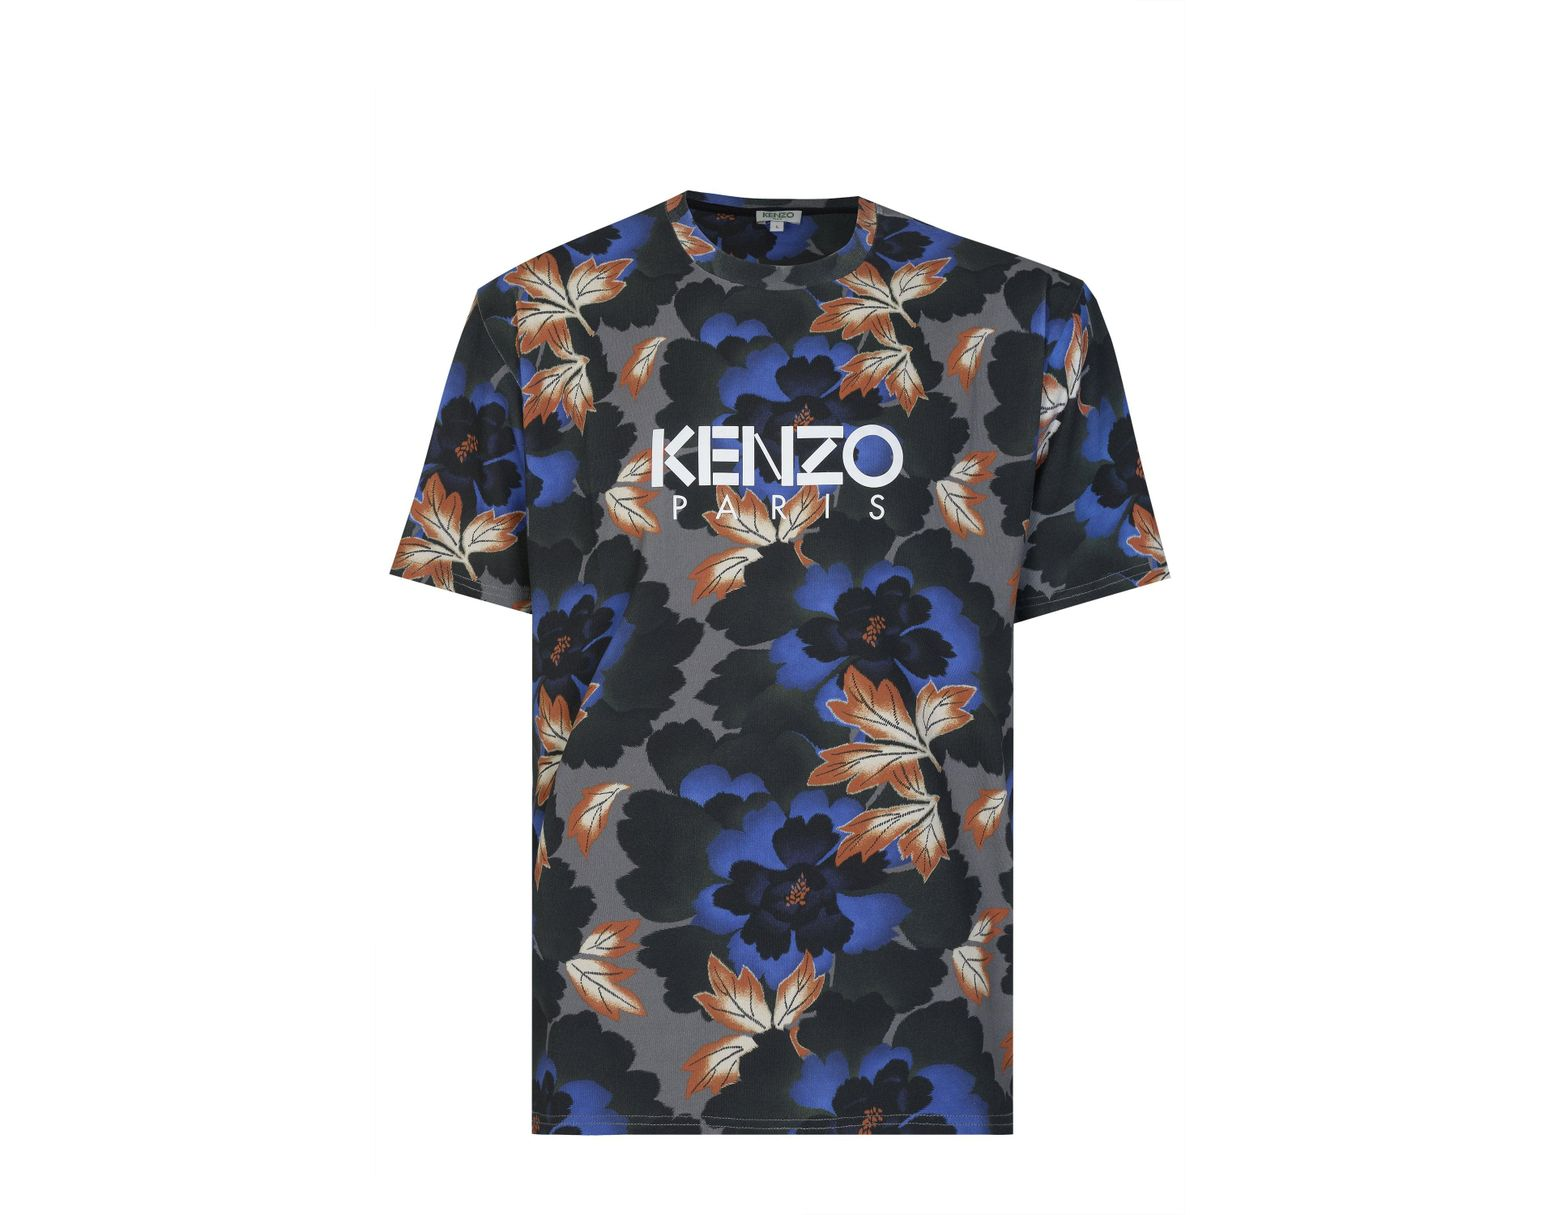 924be9fb9 KENZO Paris Floral Print T-shirt in Blue for Men - Lyst